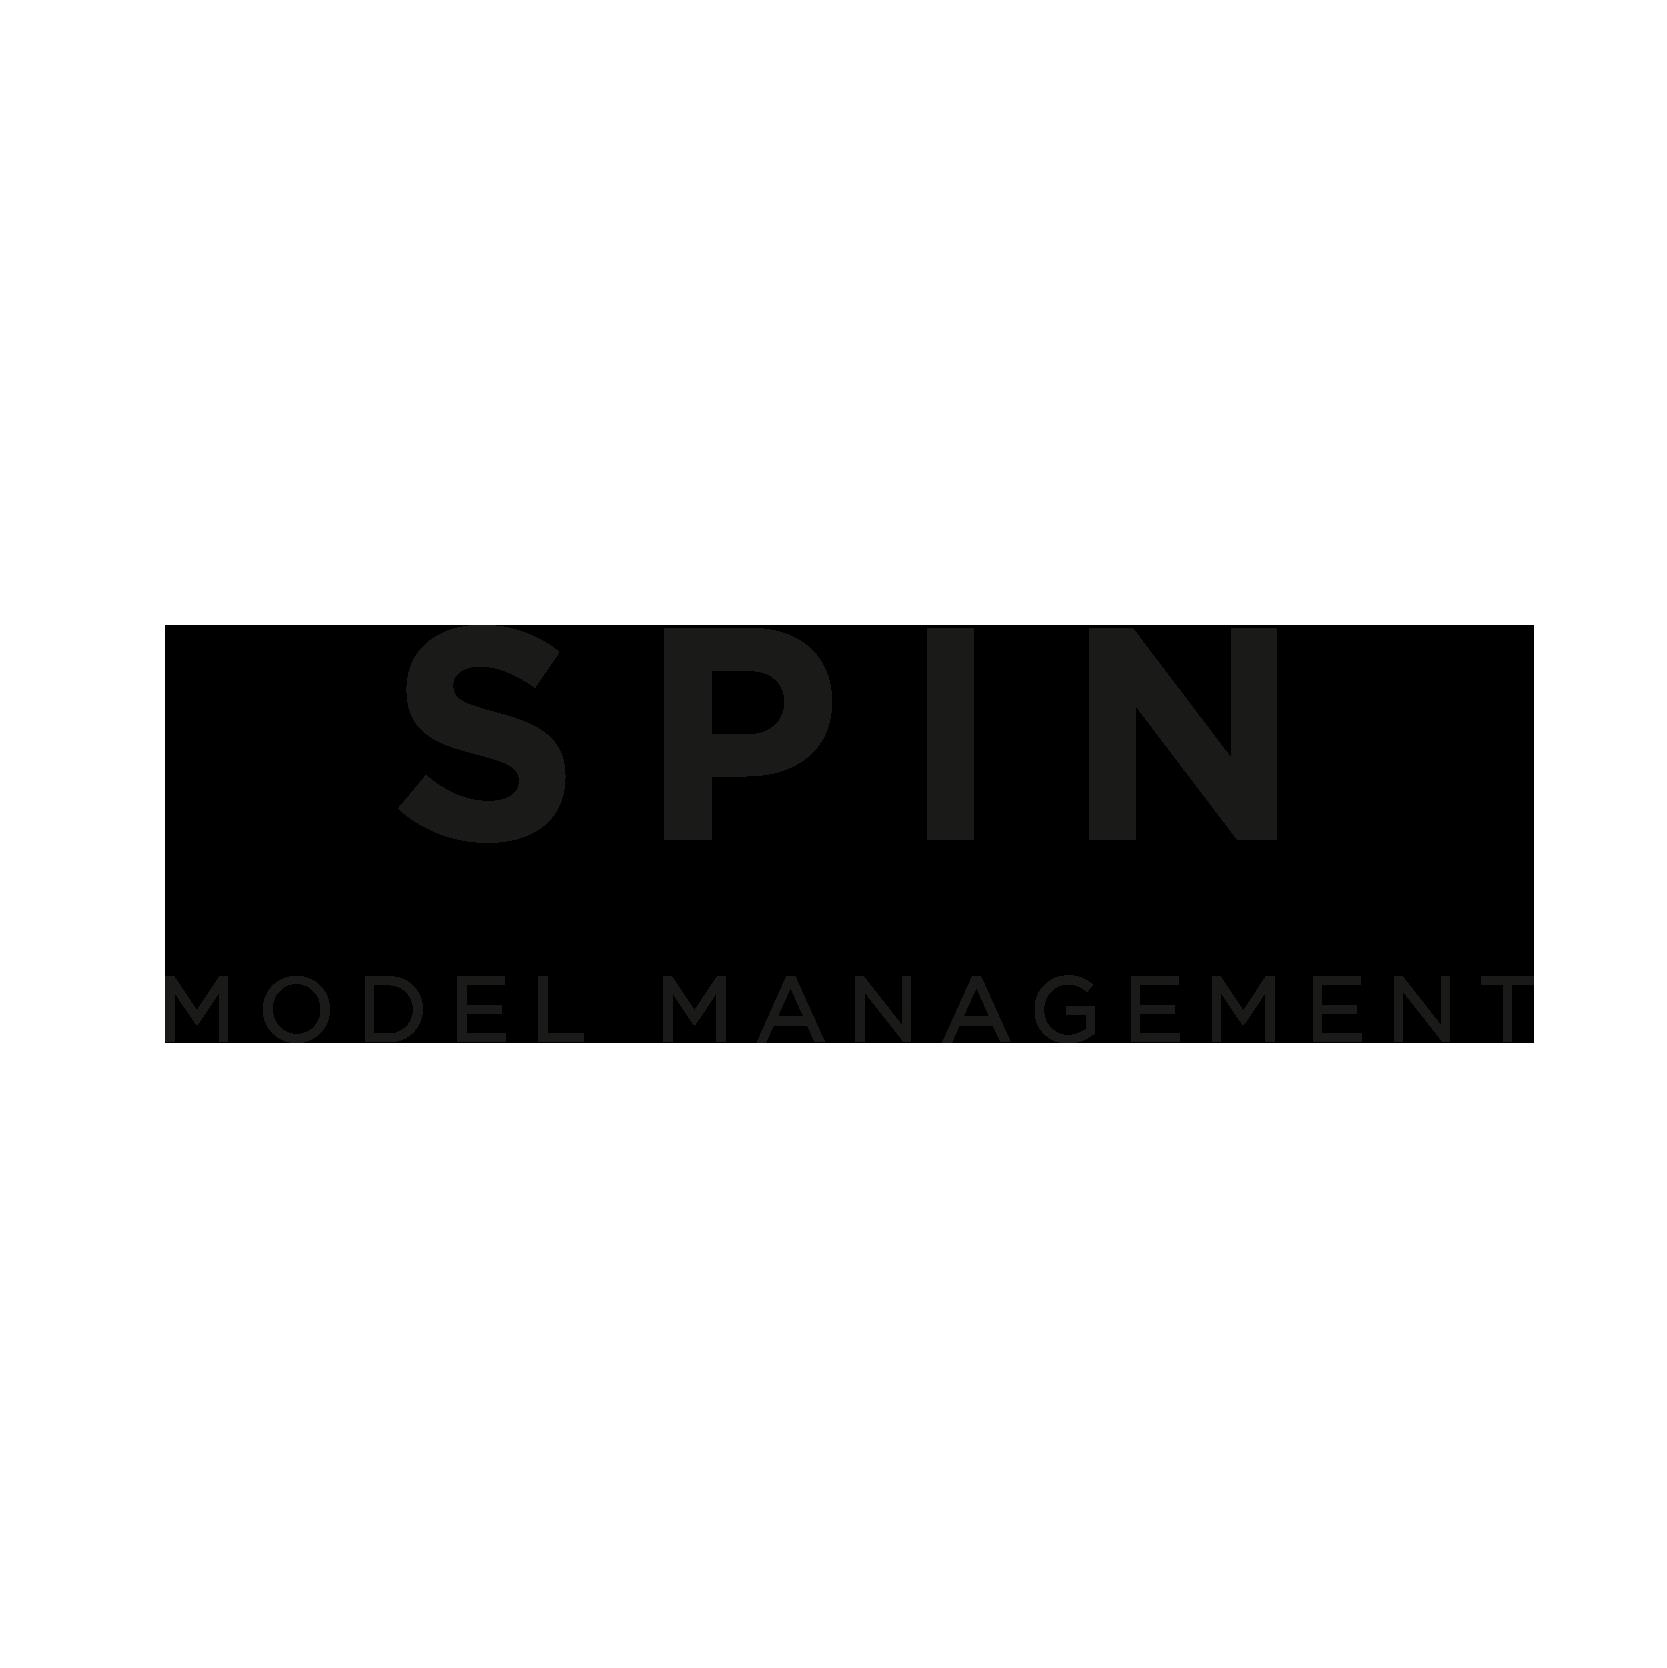 Spin Modelmanagement Logo